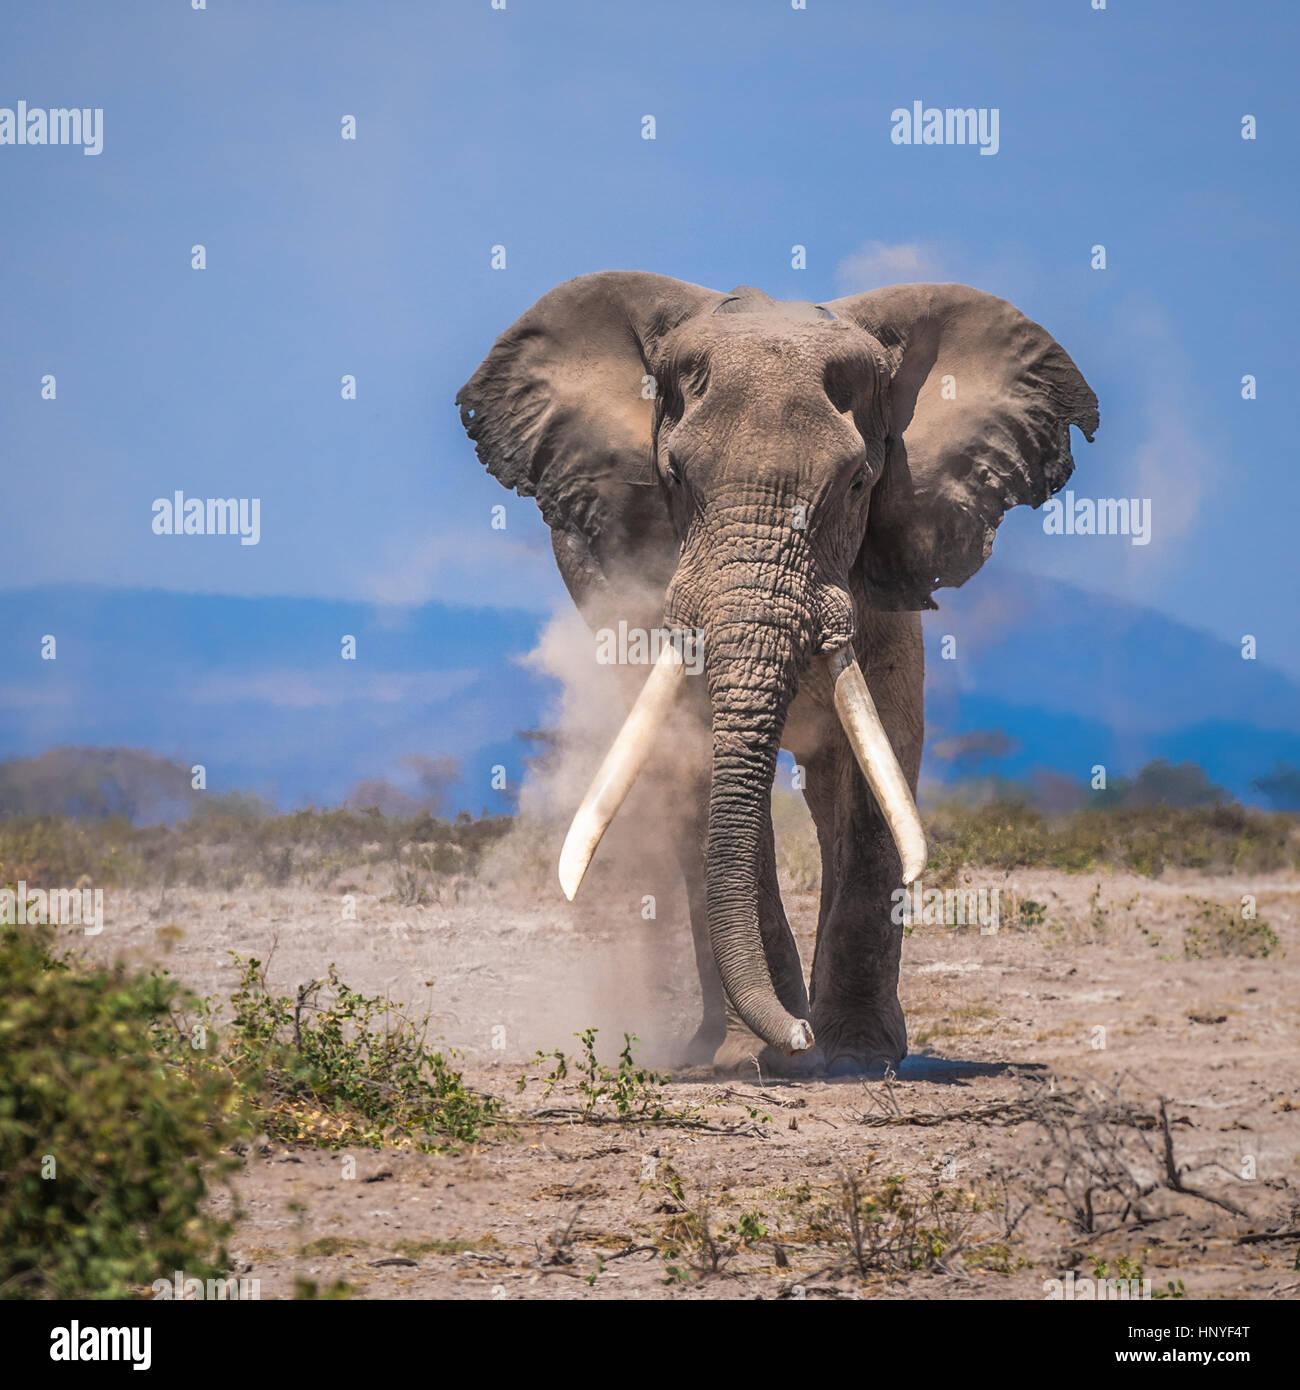 Vieux éléphant, parc national d'Amboseli, Kenya Photo Stock